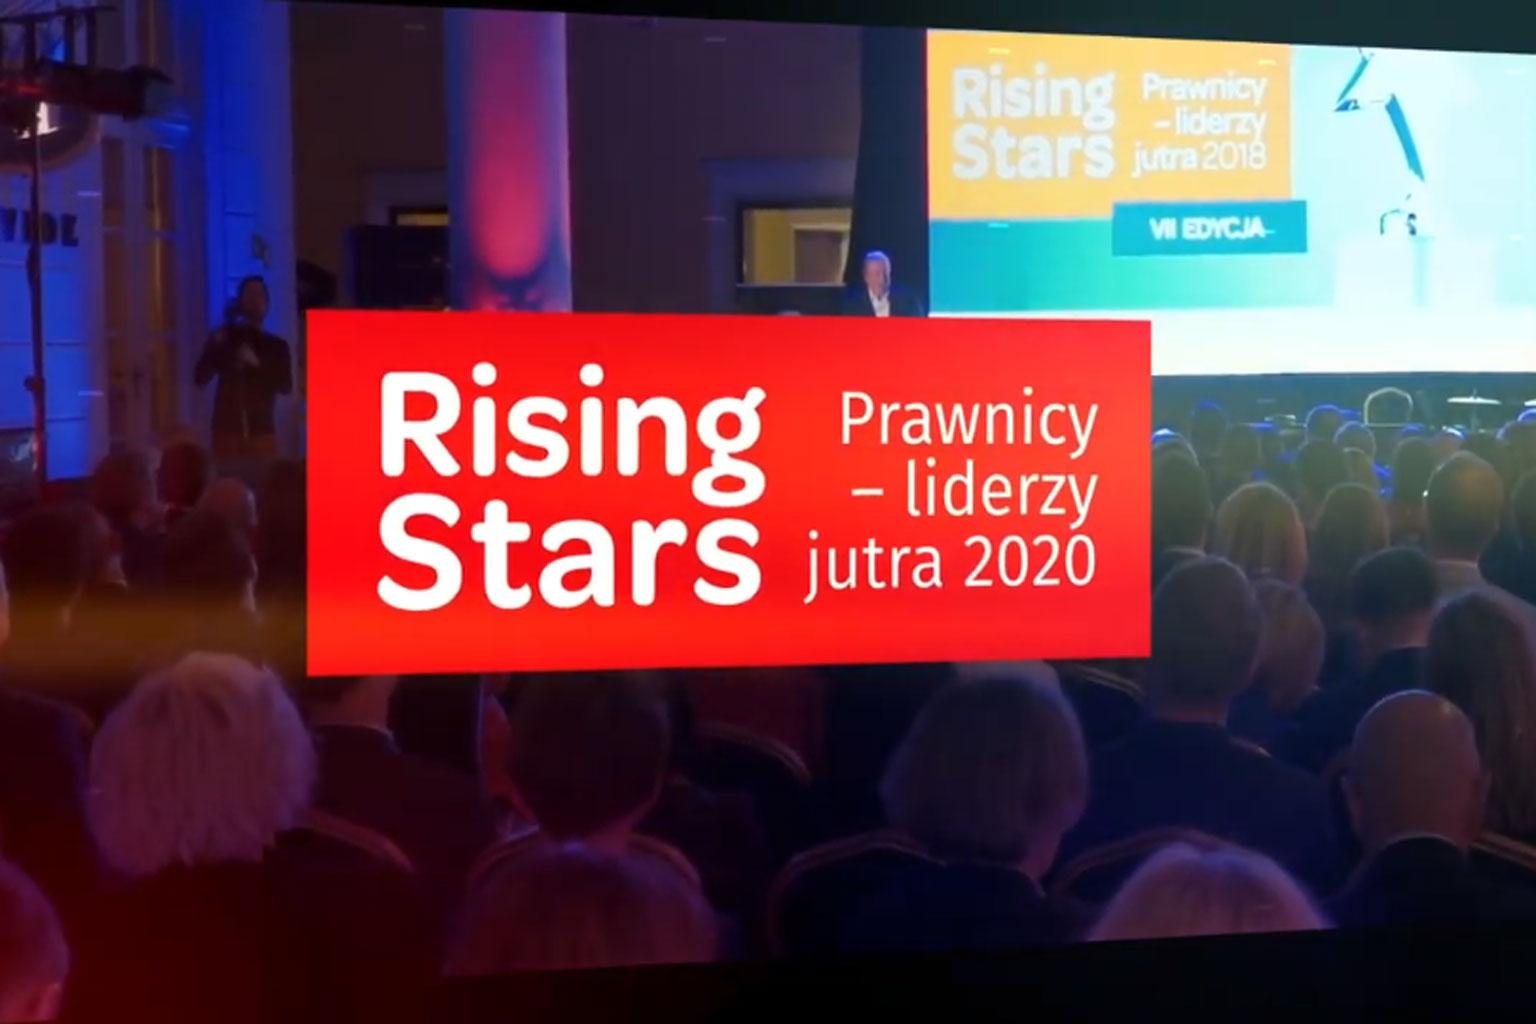 Rising Stars Prawnicy - liderzy jutra